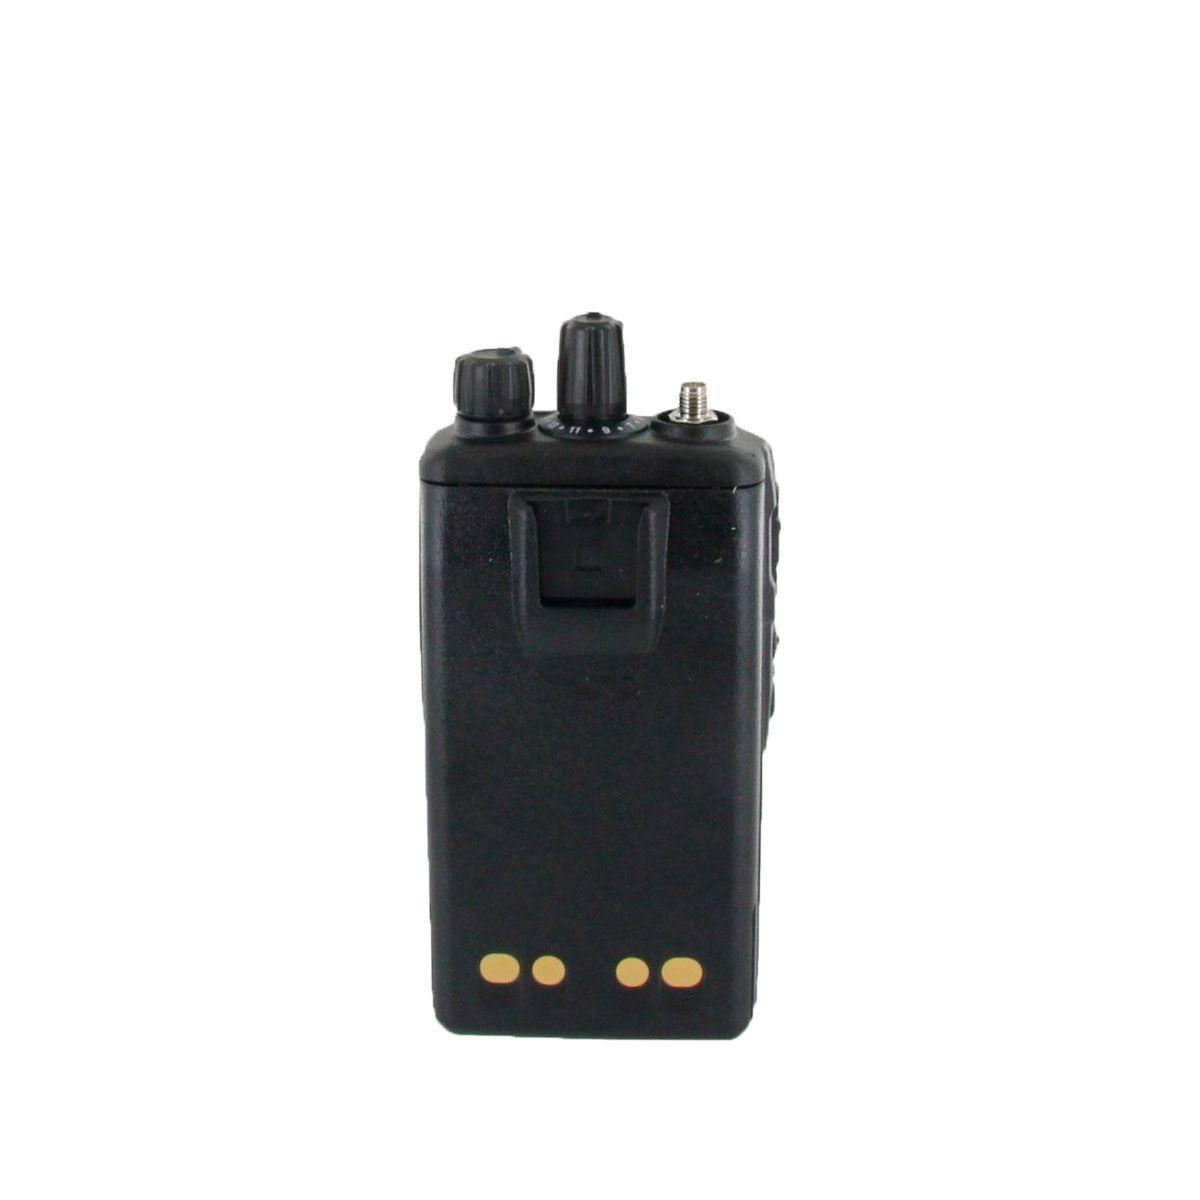 Radio Motorola EVX-261 Digital EVX-261-G6 UHF 403-470 MHz